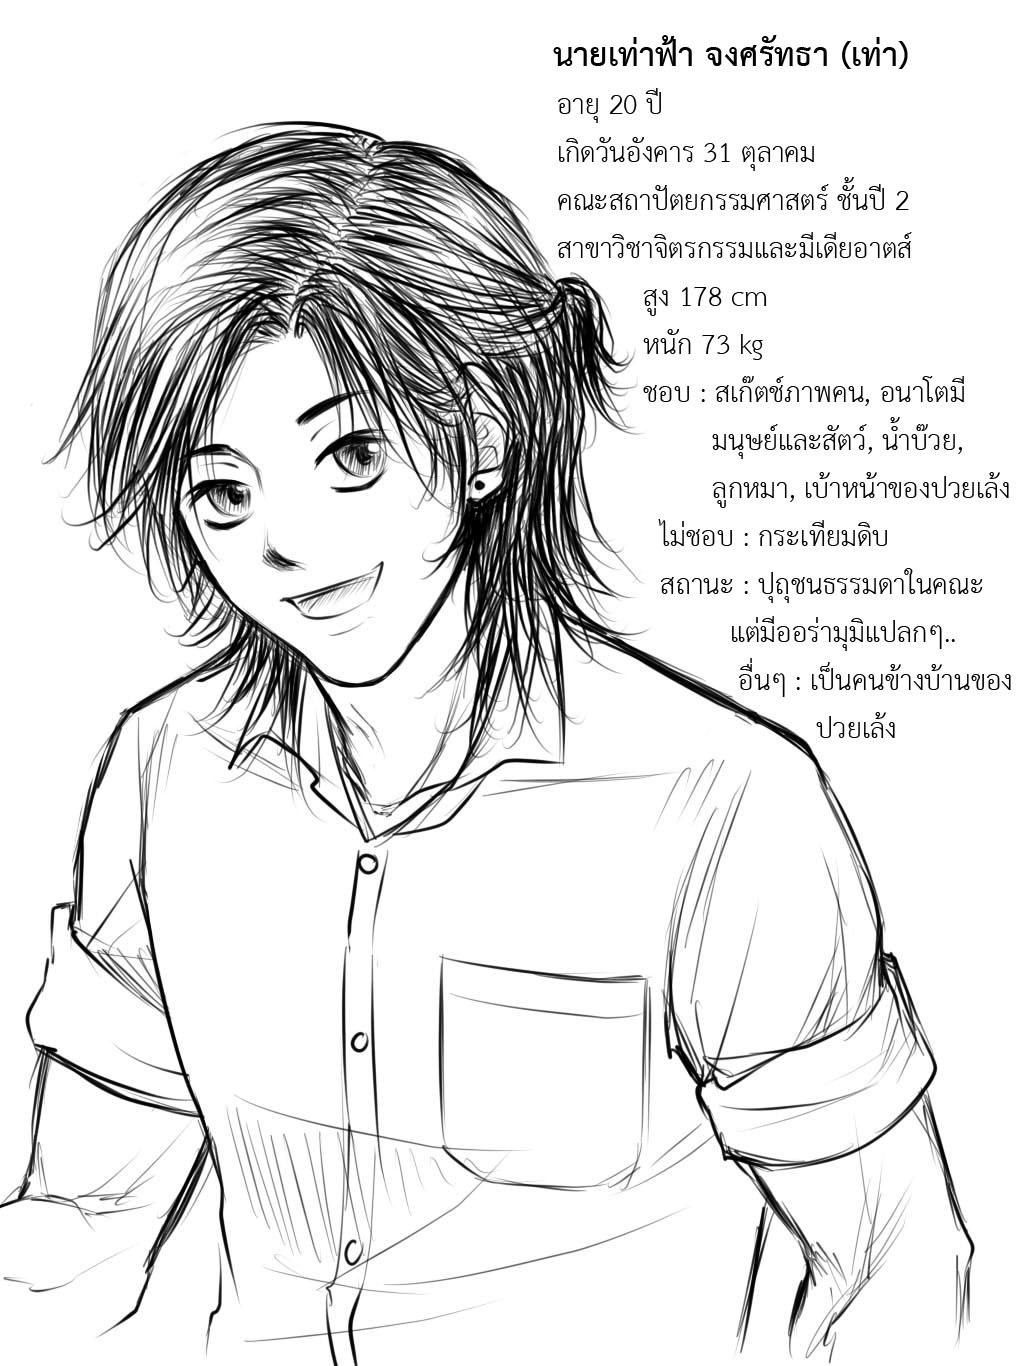 Profile - แนะนำตัวละคร (เพิ่มเติมตัวละครเรื่อยๆ)